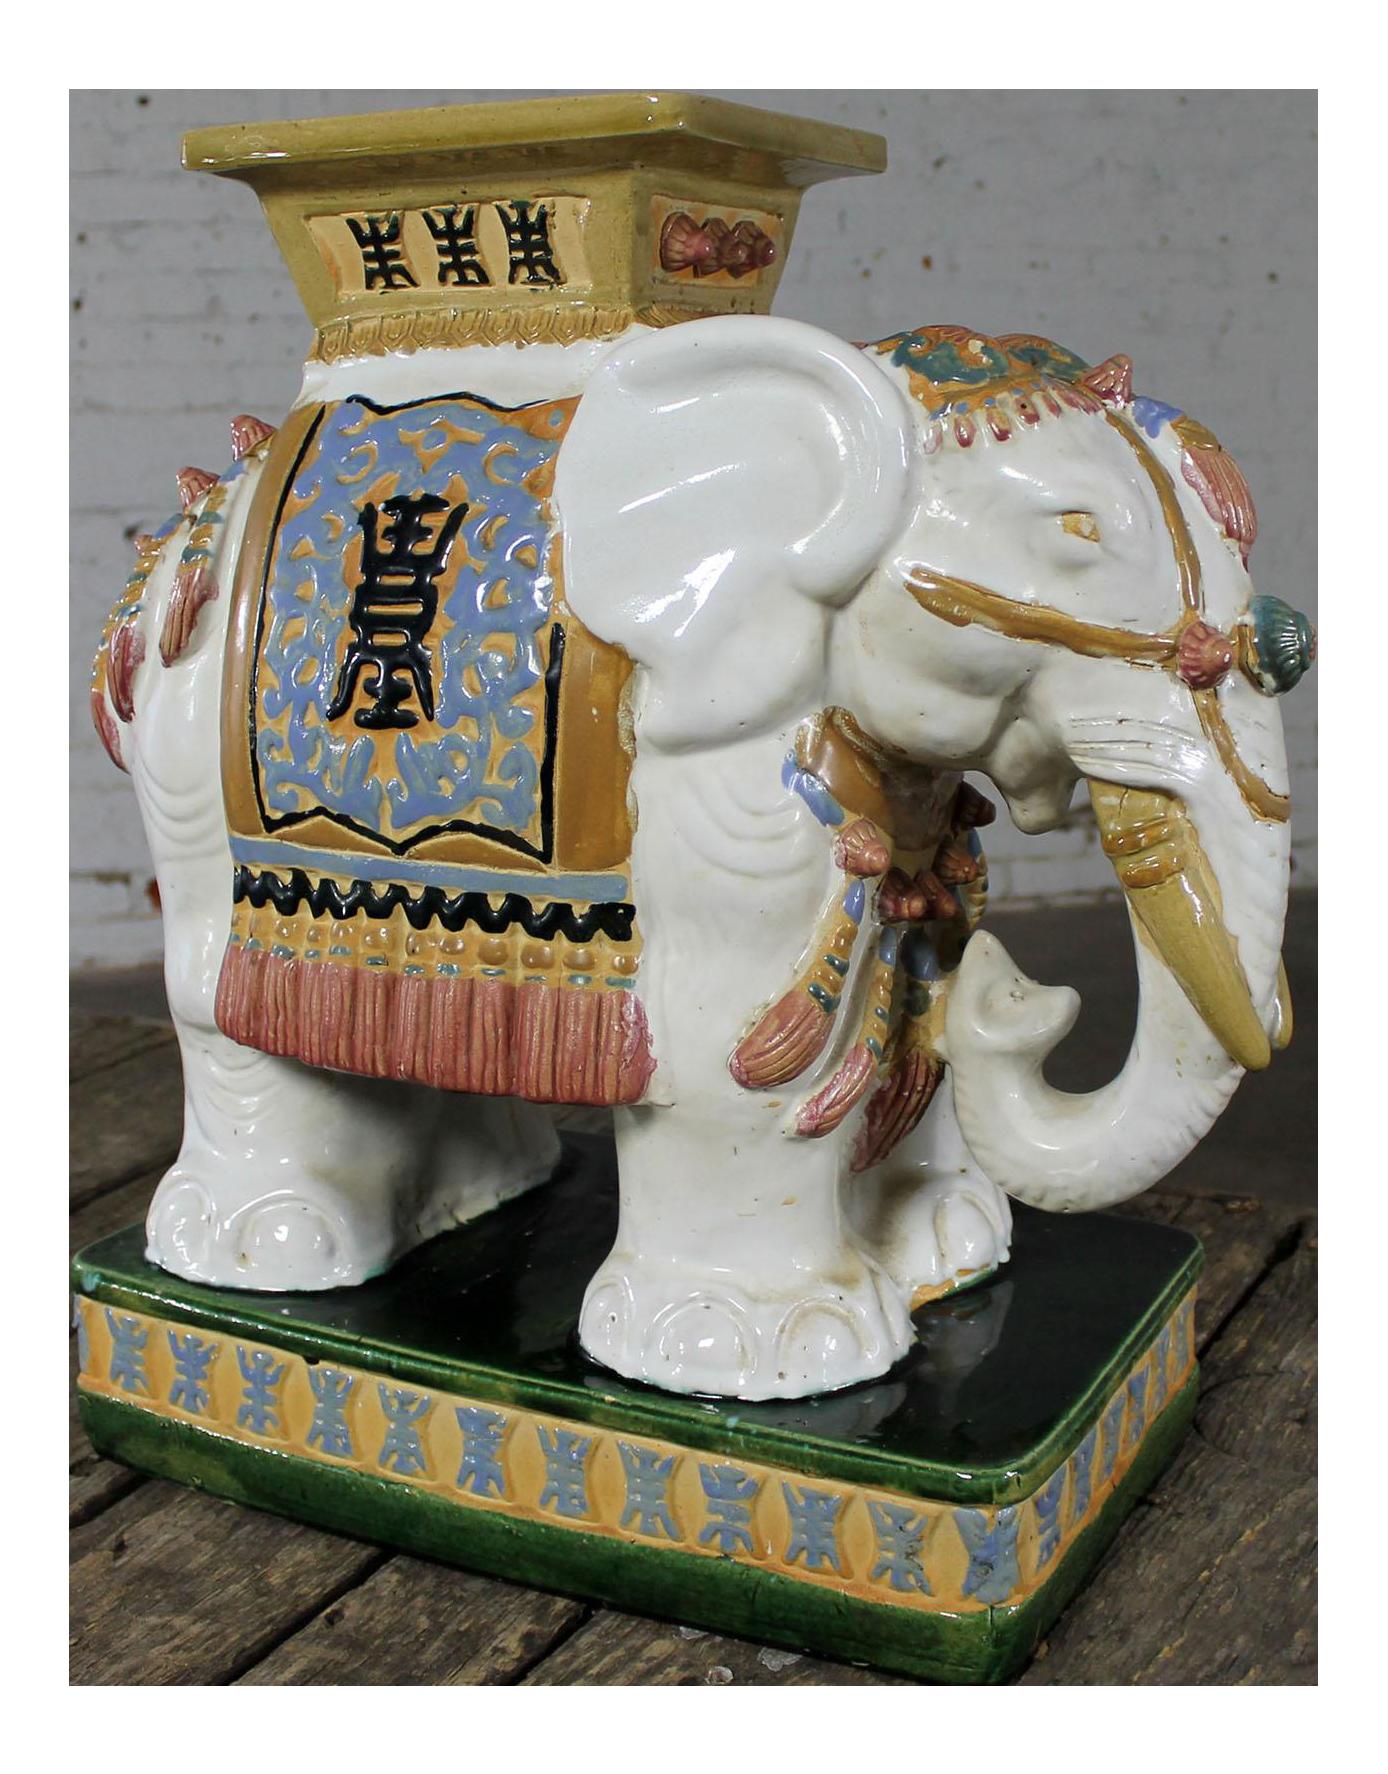 Great Vintage Ceramic Elephant Garden Stools #12 - Elephant Garden Stool Side End Table Stand Vintage Made In Vietnam